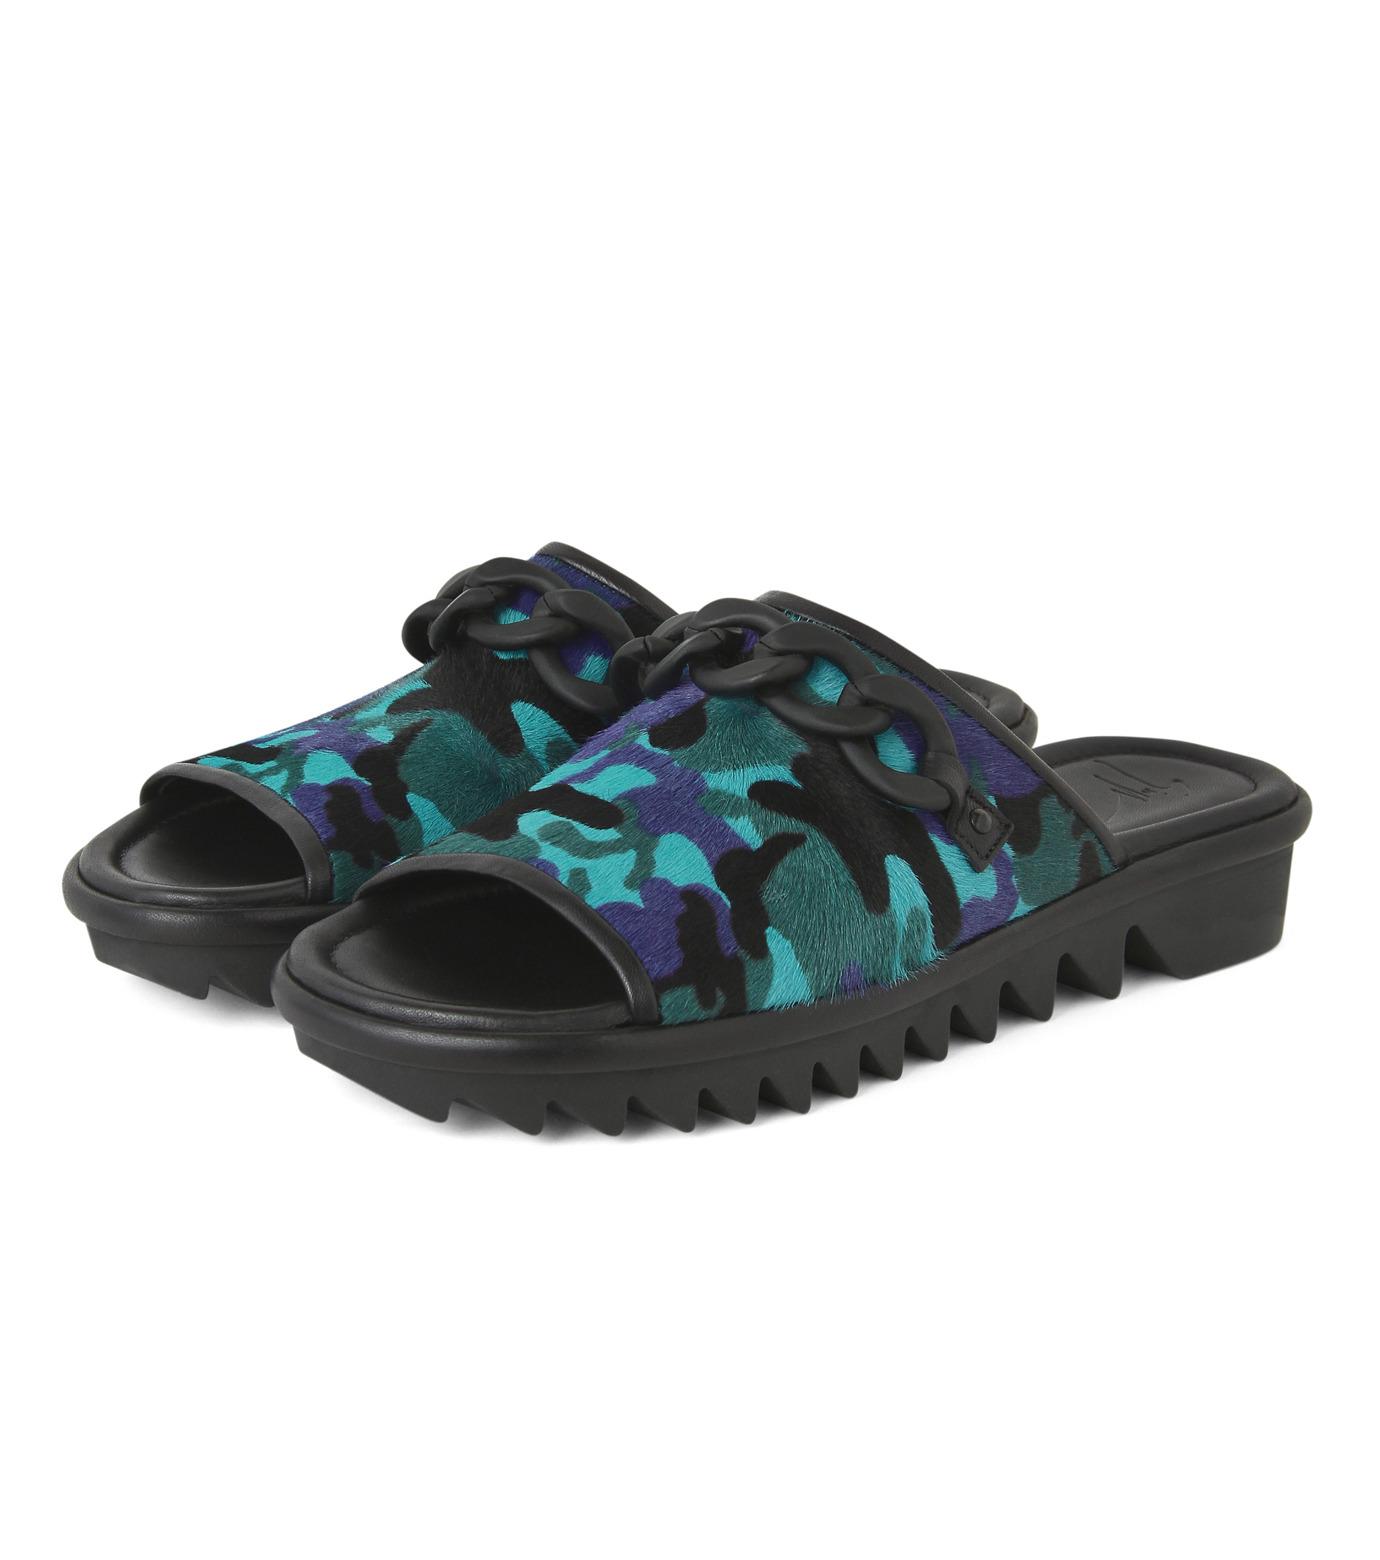 Giuseppe Zanotti Design(ジュゼッペザノッティ)のBaby Fur Camouflage Slippers-BLUE(シューズ/shoes)-RM5067LO-T-92 拡大詳細画像3